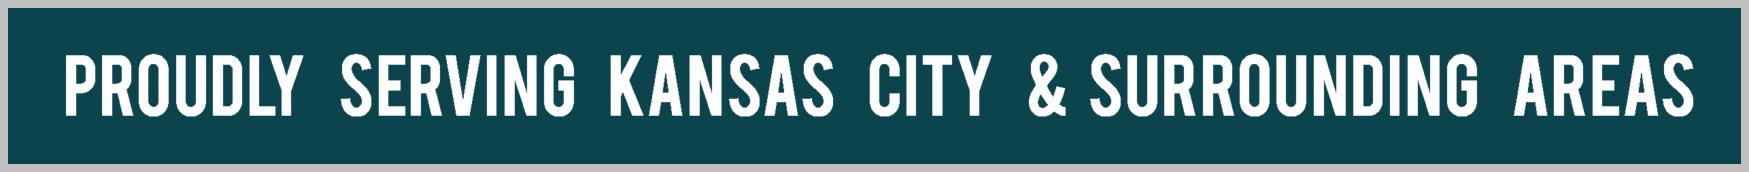 serving kansas city and surrounding areas